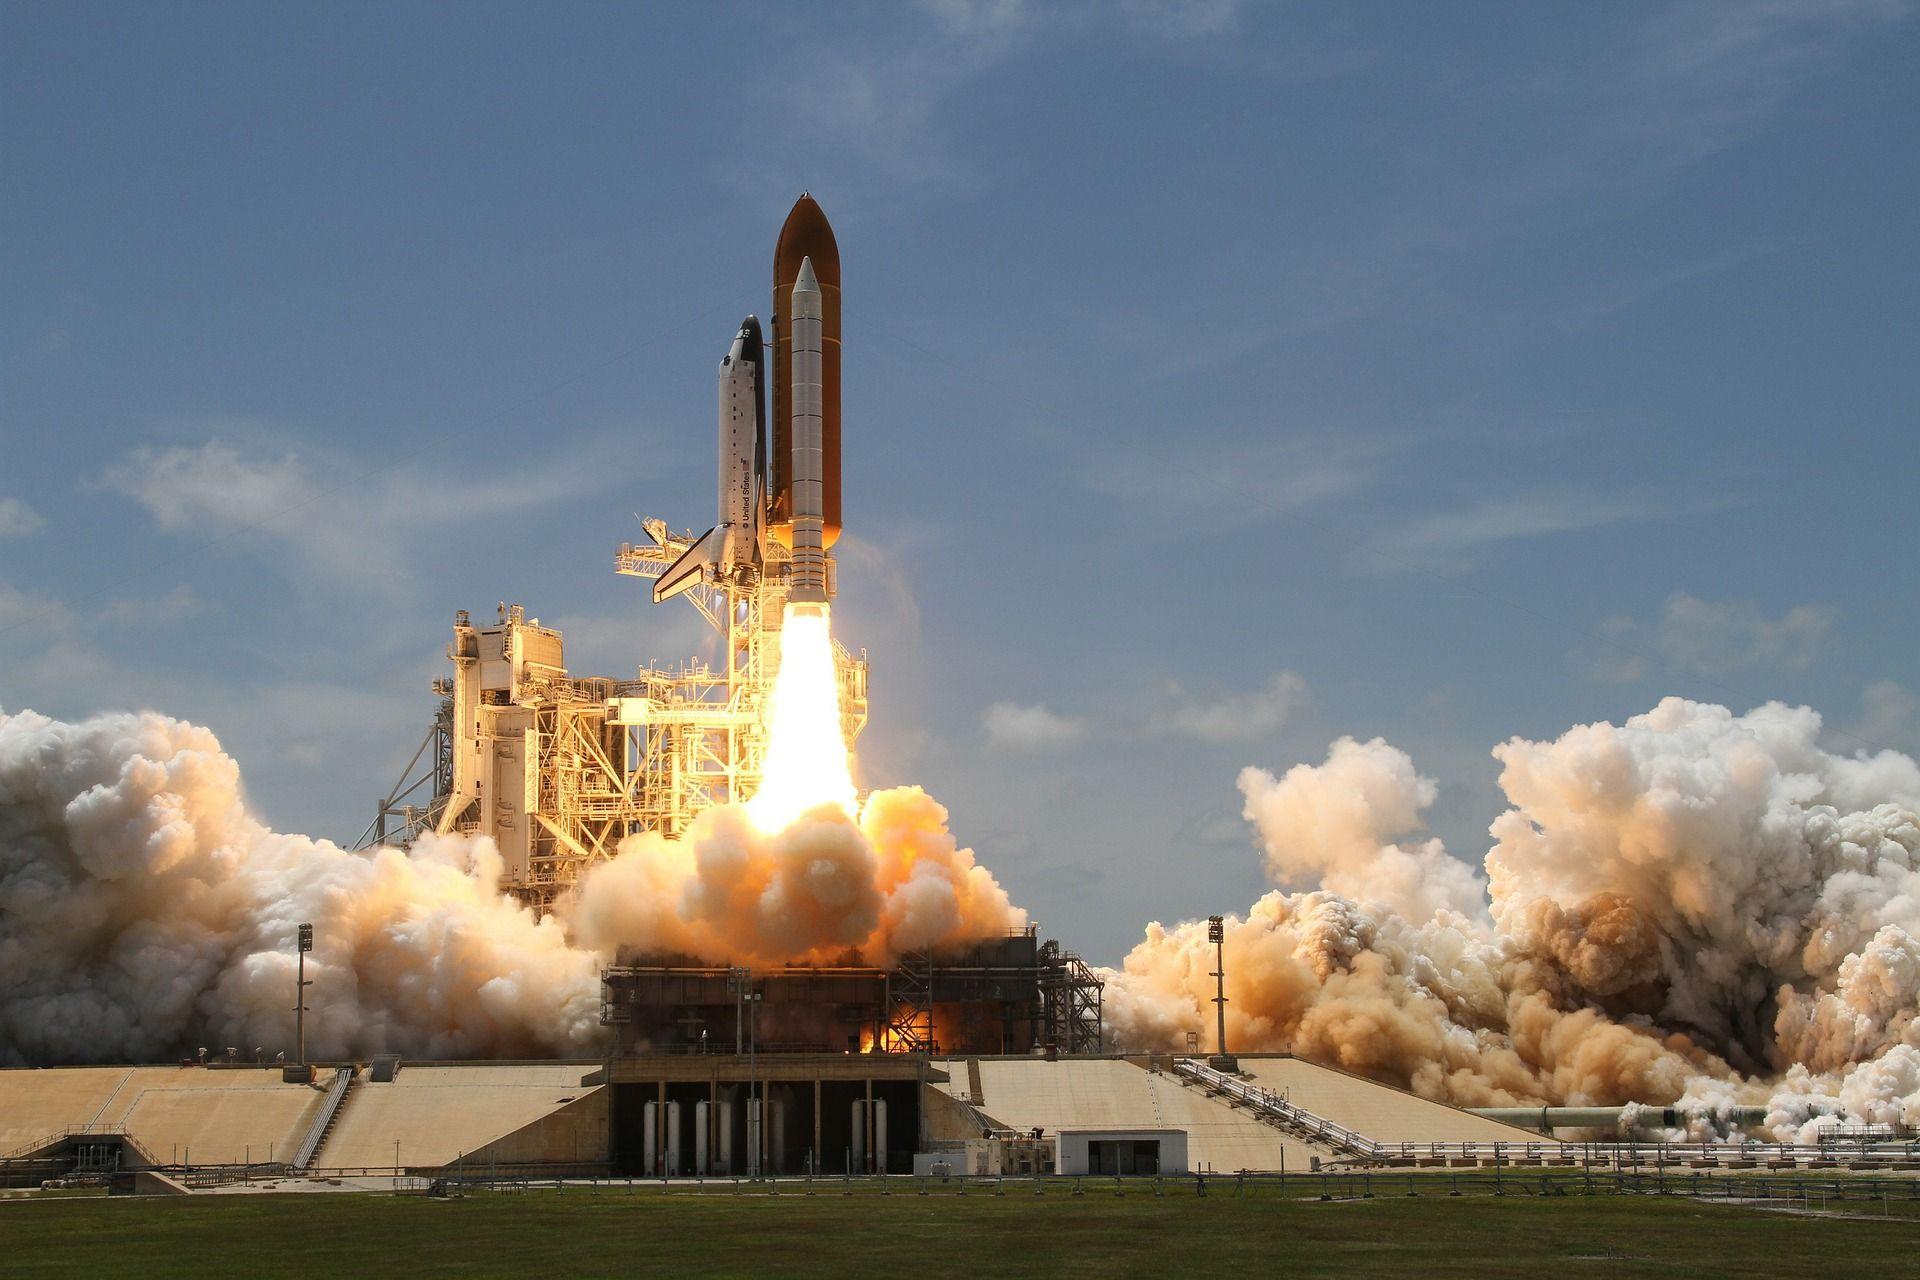 André Kuipers neemt ons met SpaceX mee de ruimte in